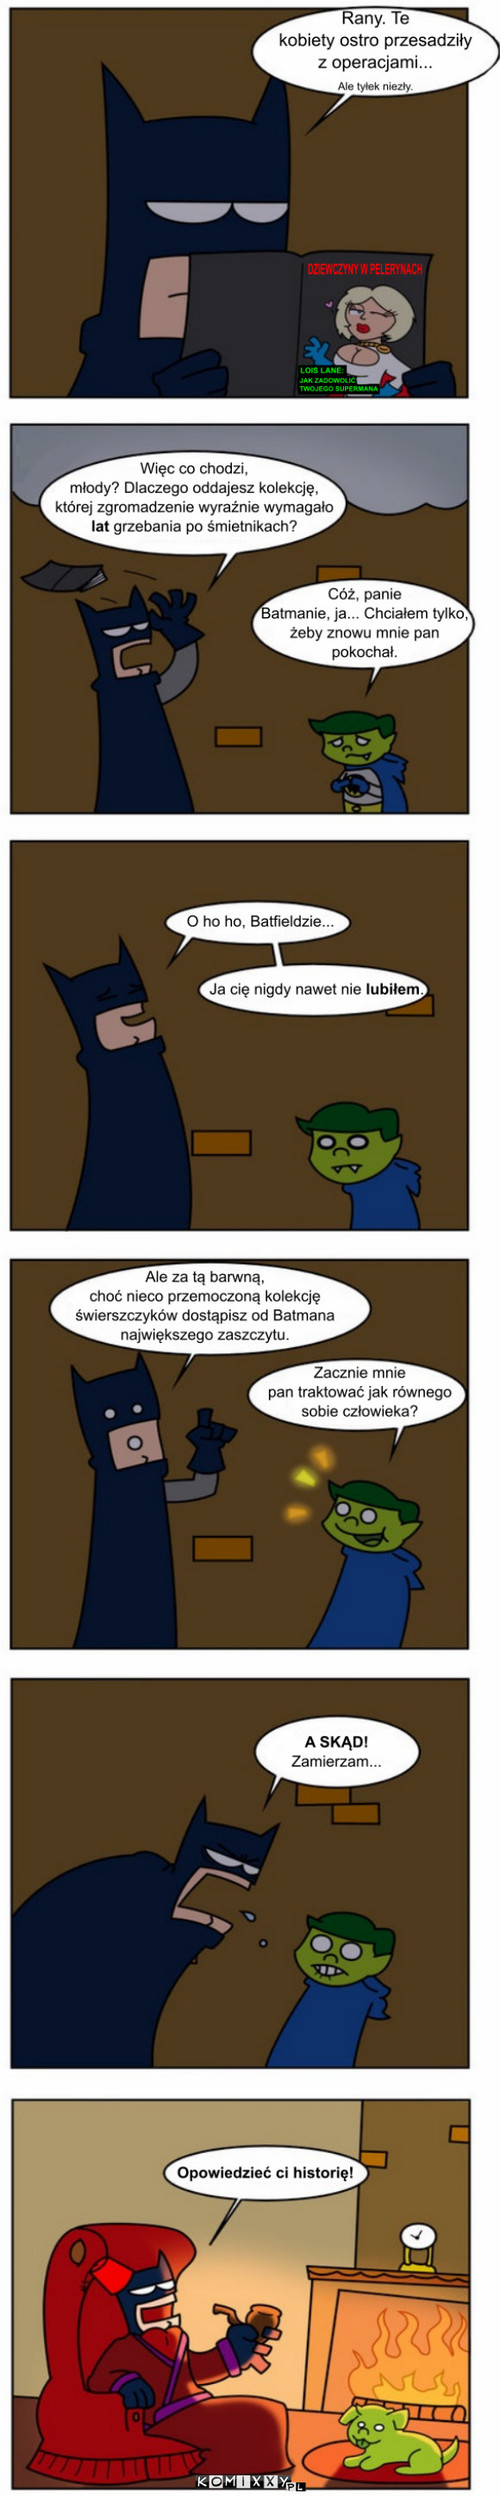 I Bat i bat tytani 17 komiks internetowy